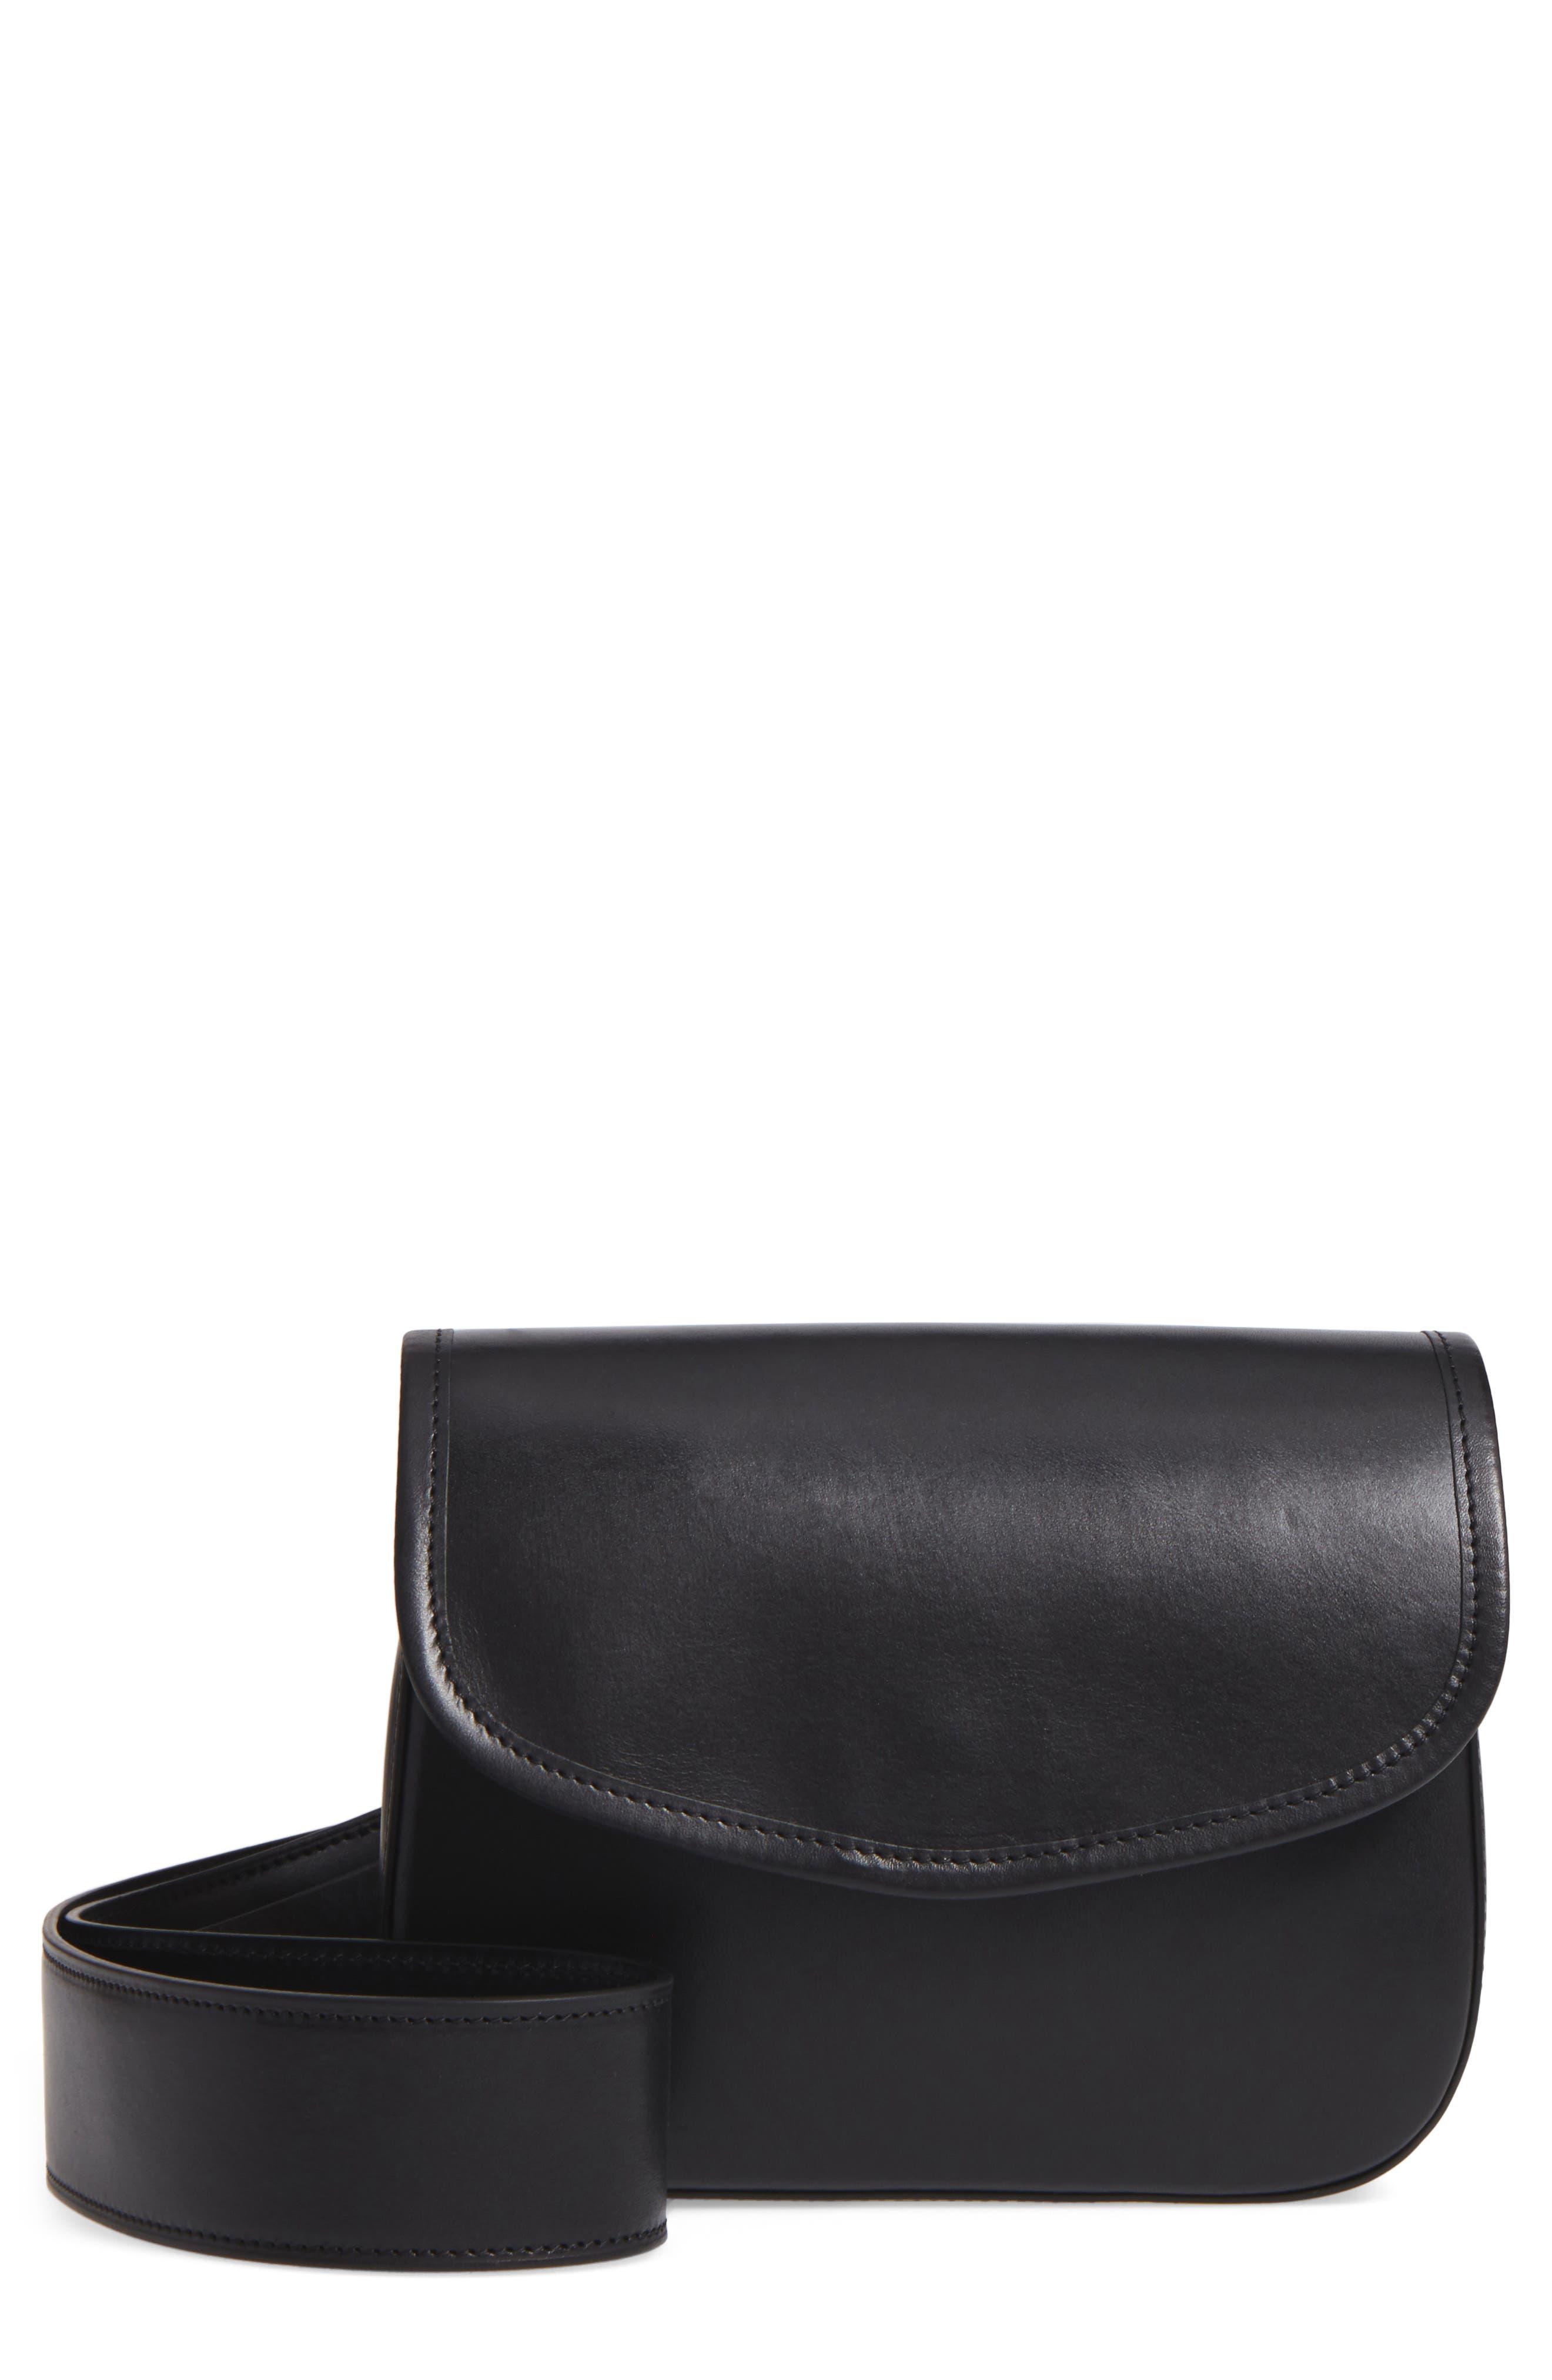 Alternate Image 1 Selected - Simone Rocha Small Flap Crossbody Bag